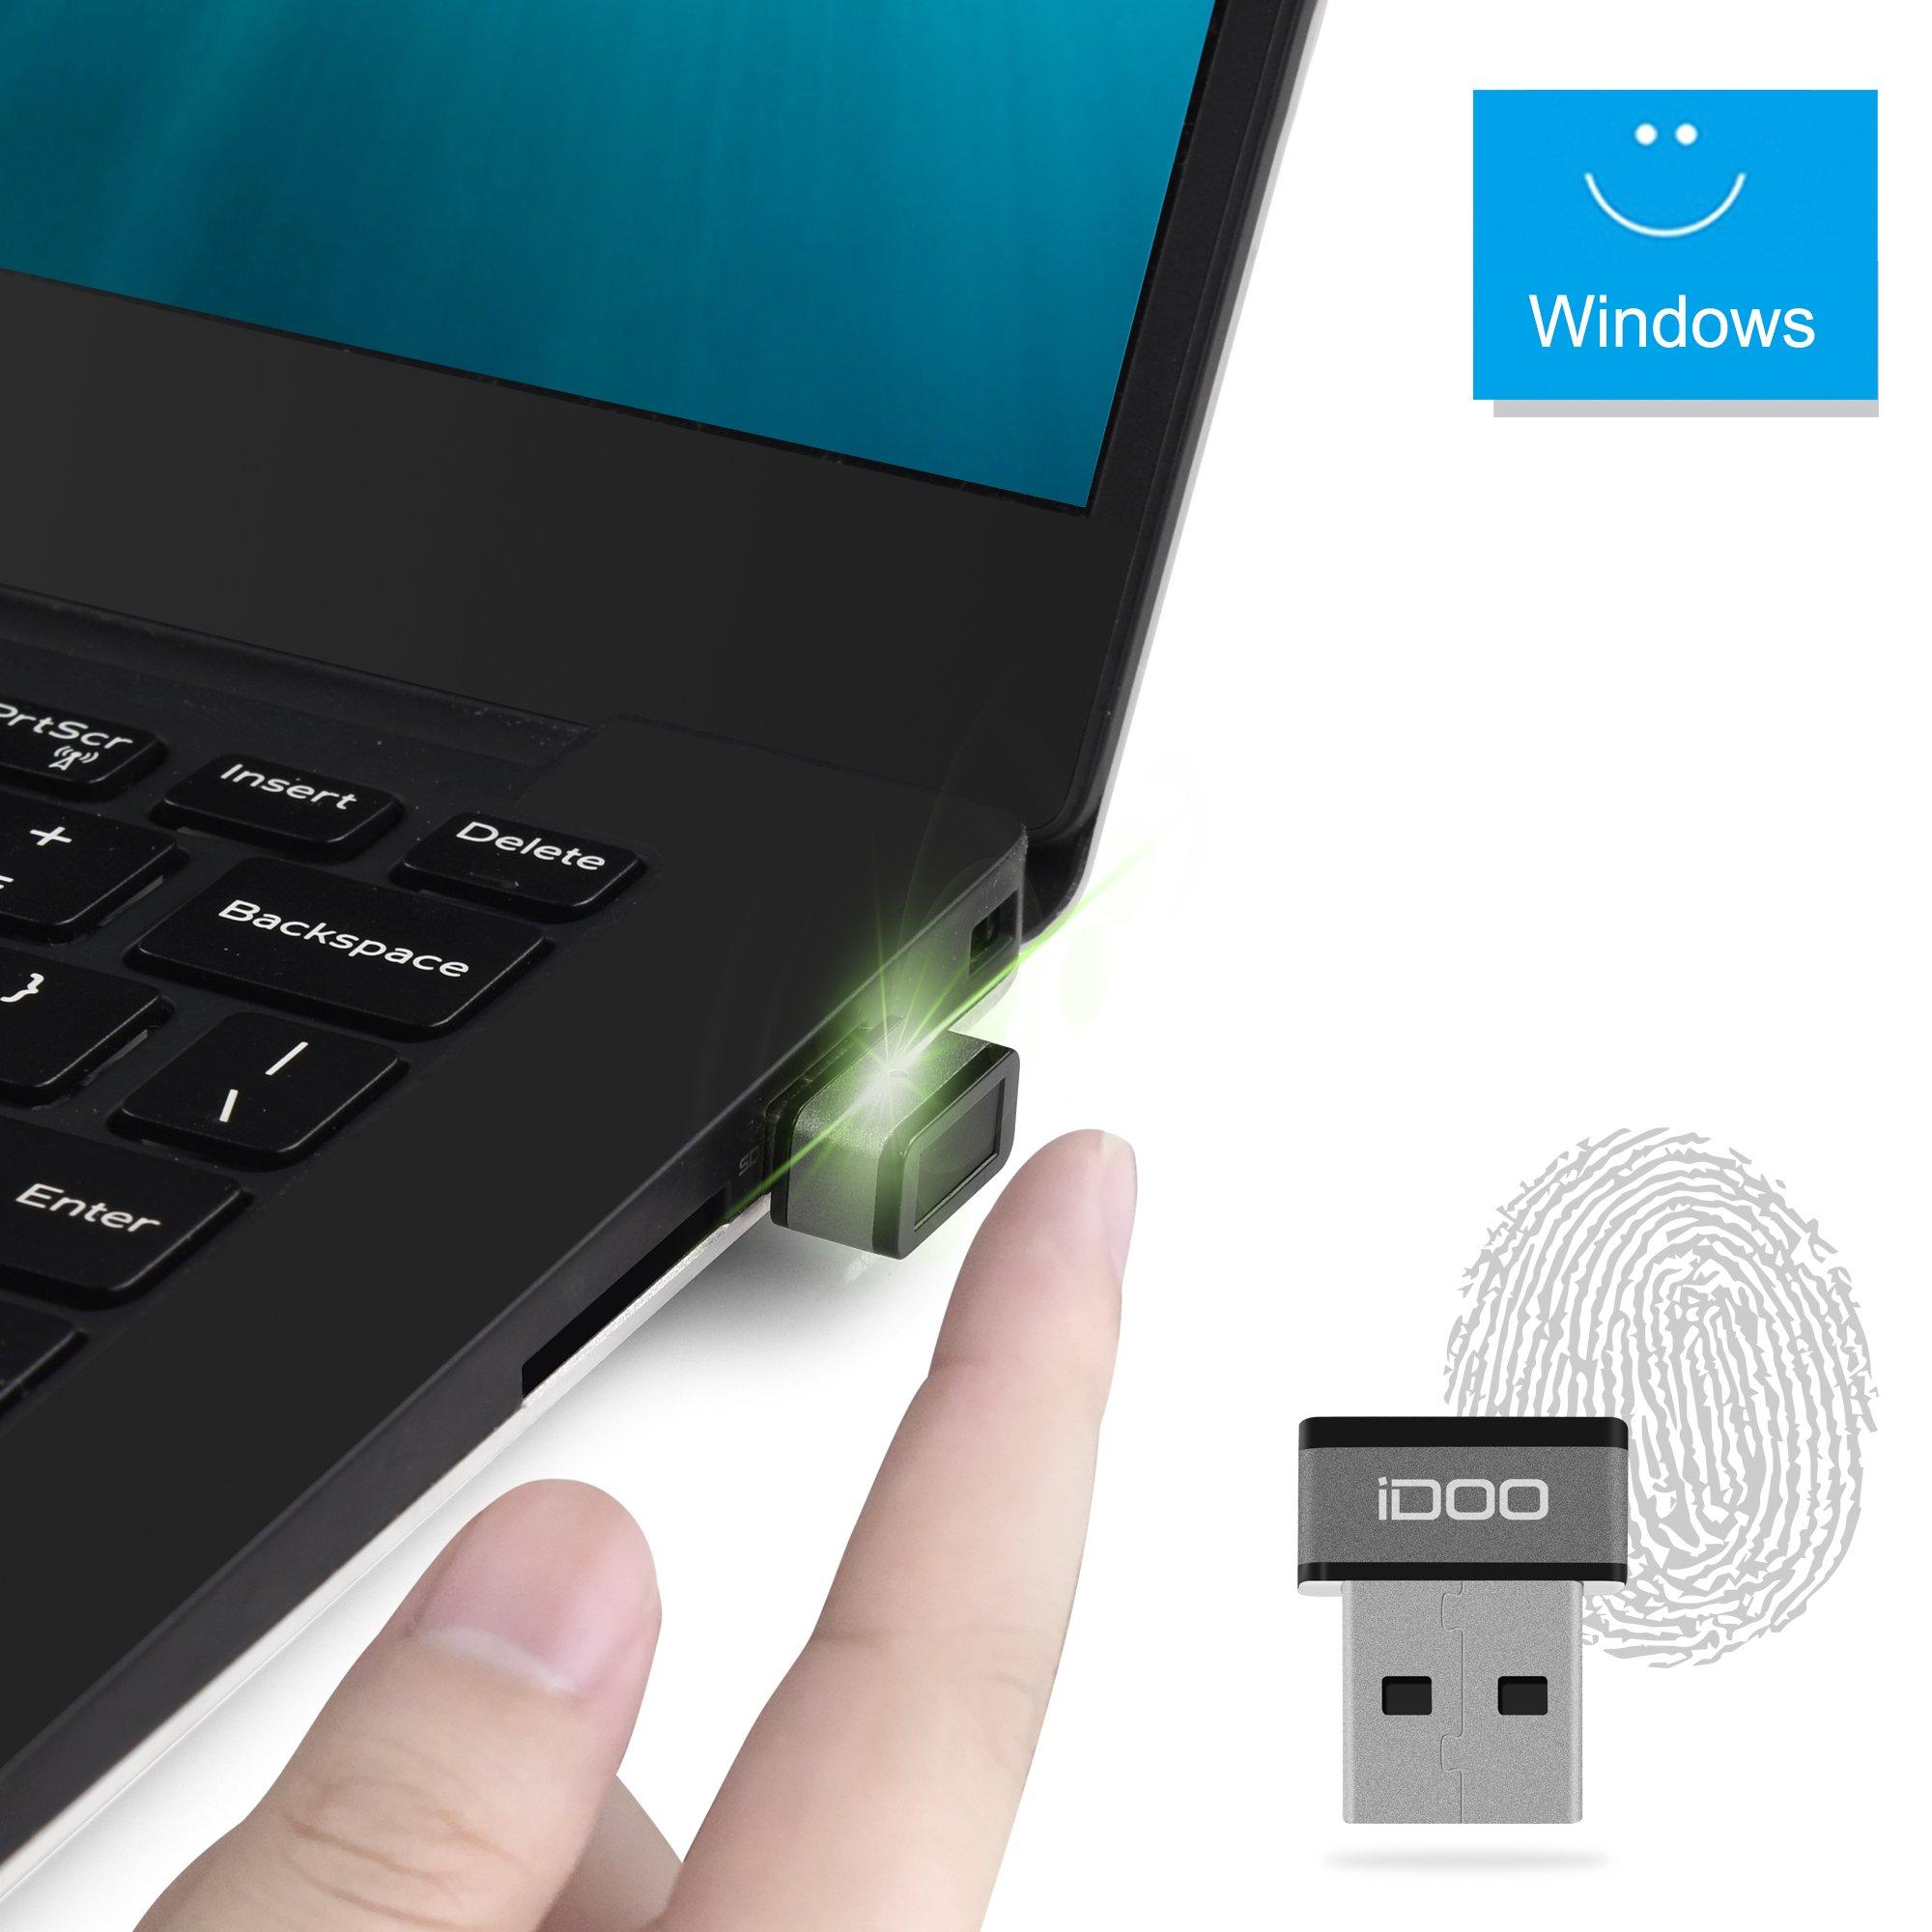 Mini USB Fingerprint Reader for Windows 7/8/10 Hello, iDOO Lockey USB Fingerprint Sensor, 360 degree Touch Speedy Matching Fingerprint Scanner Biometric Security Key PC Dongle